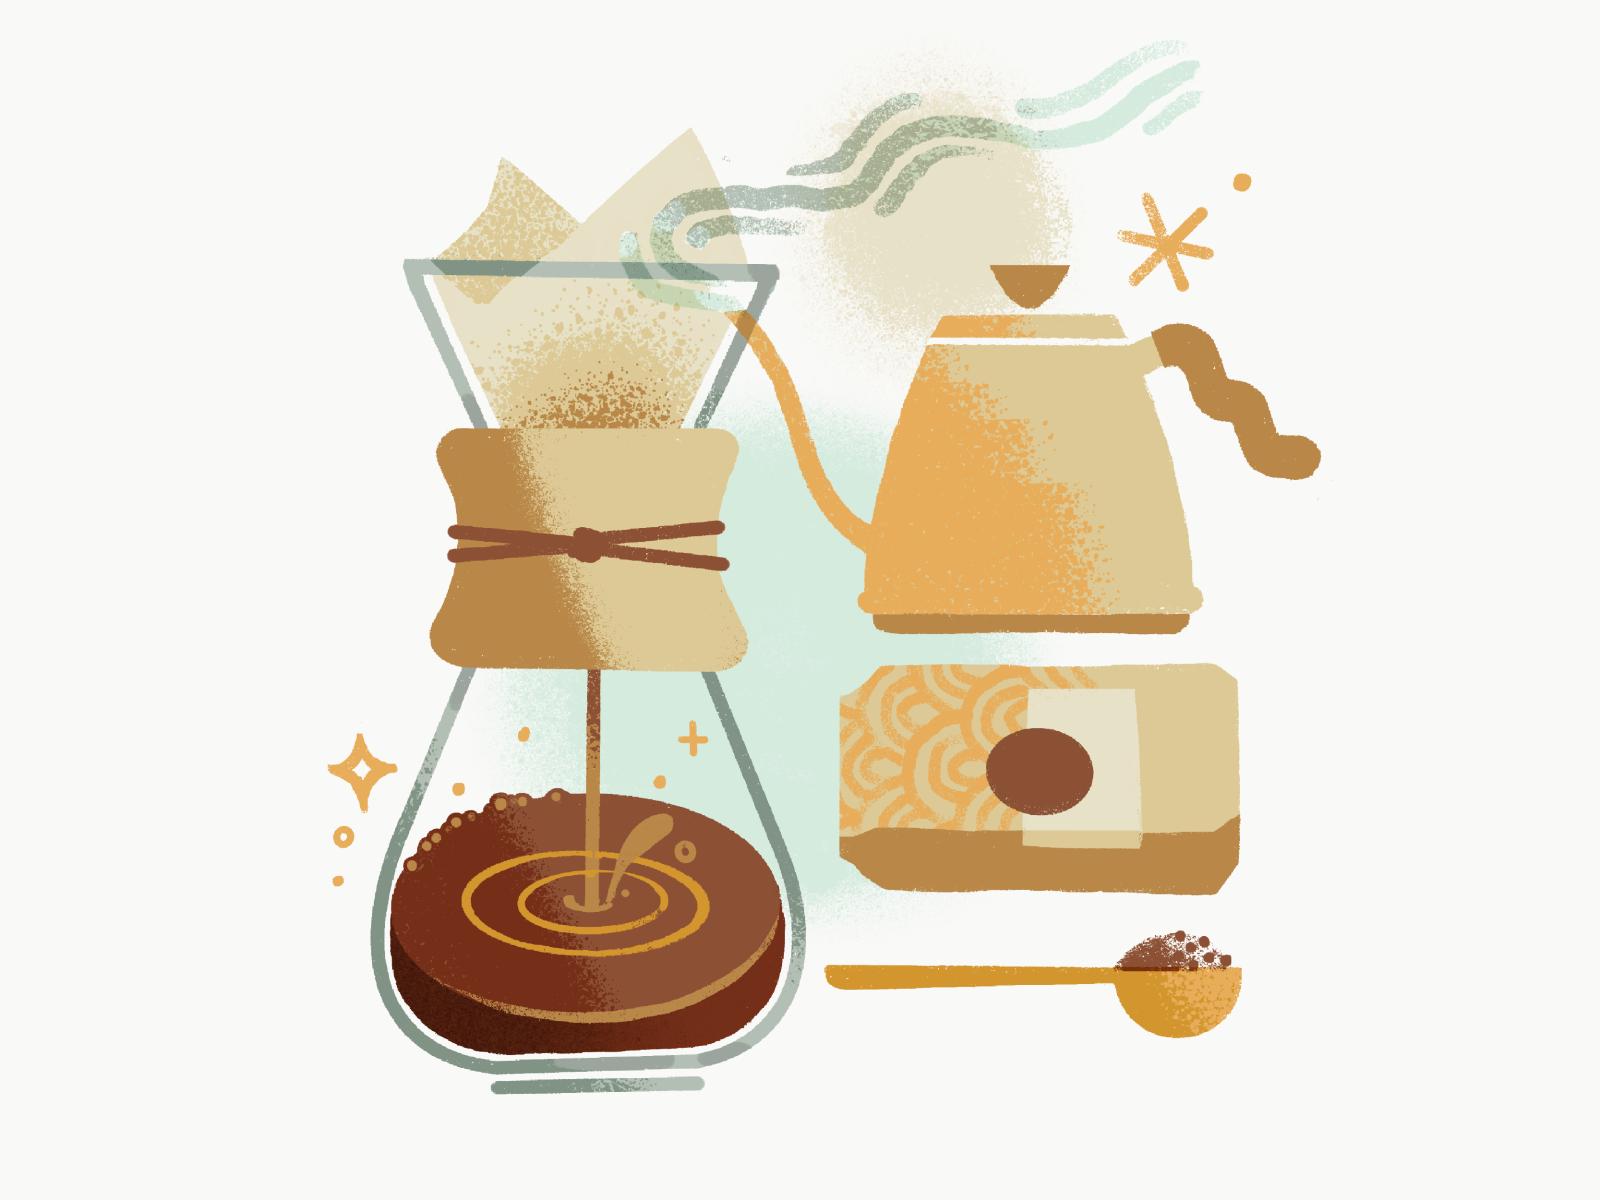 Coffee Coffee Coffee For Starbucks In 2020 Starbucks Design Coffee Academy Coffee Illustration